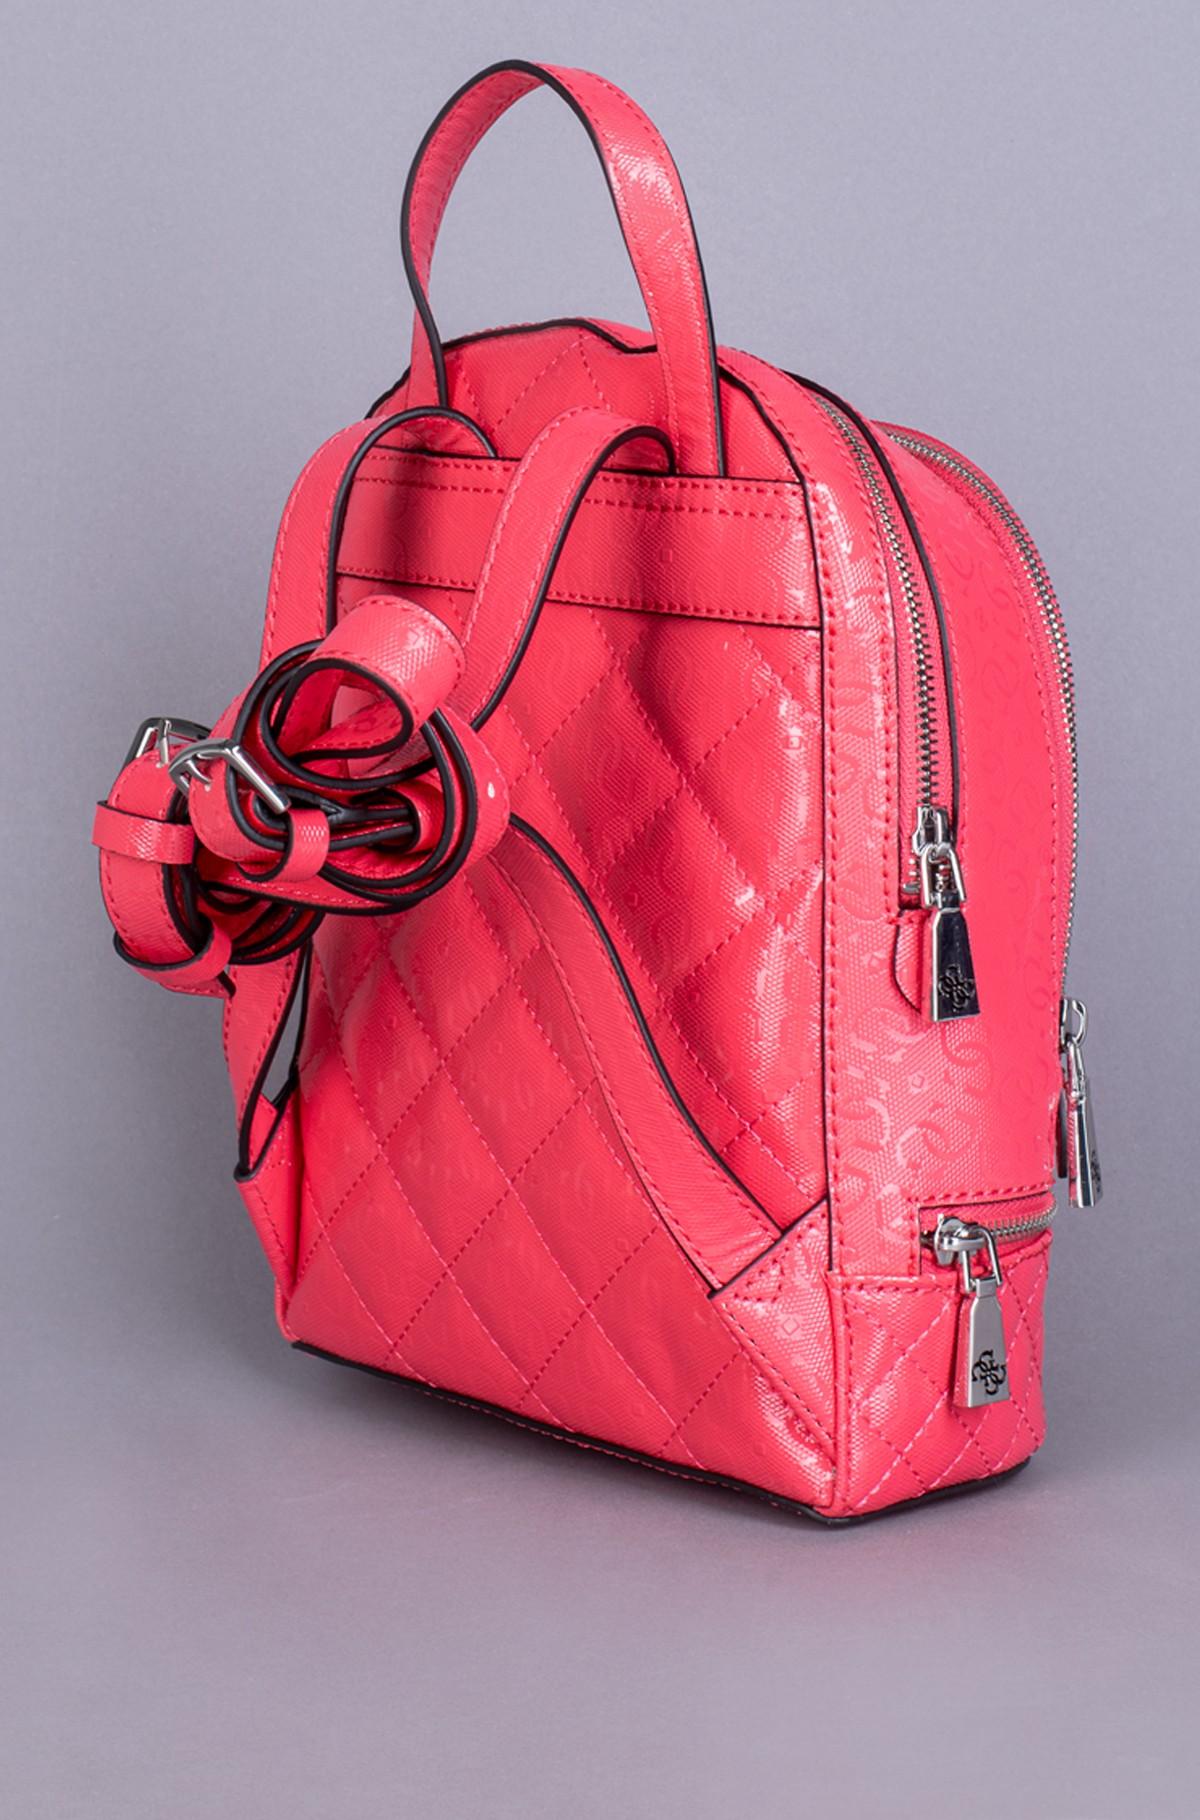 Backbag HWSY76 66320-full-3